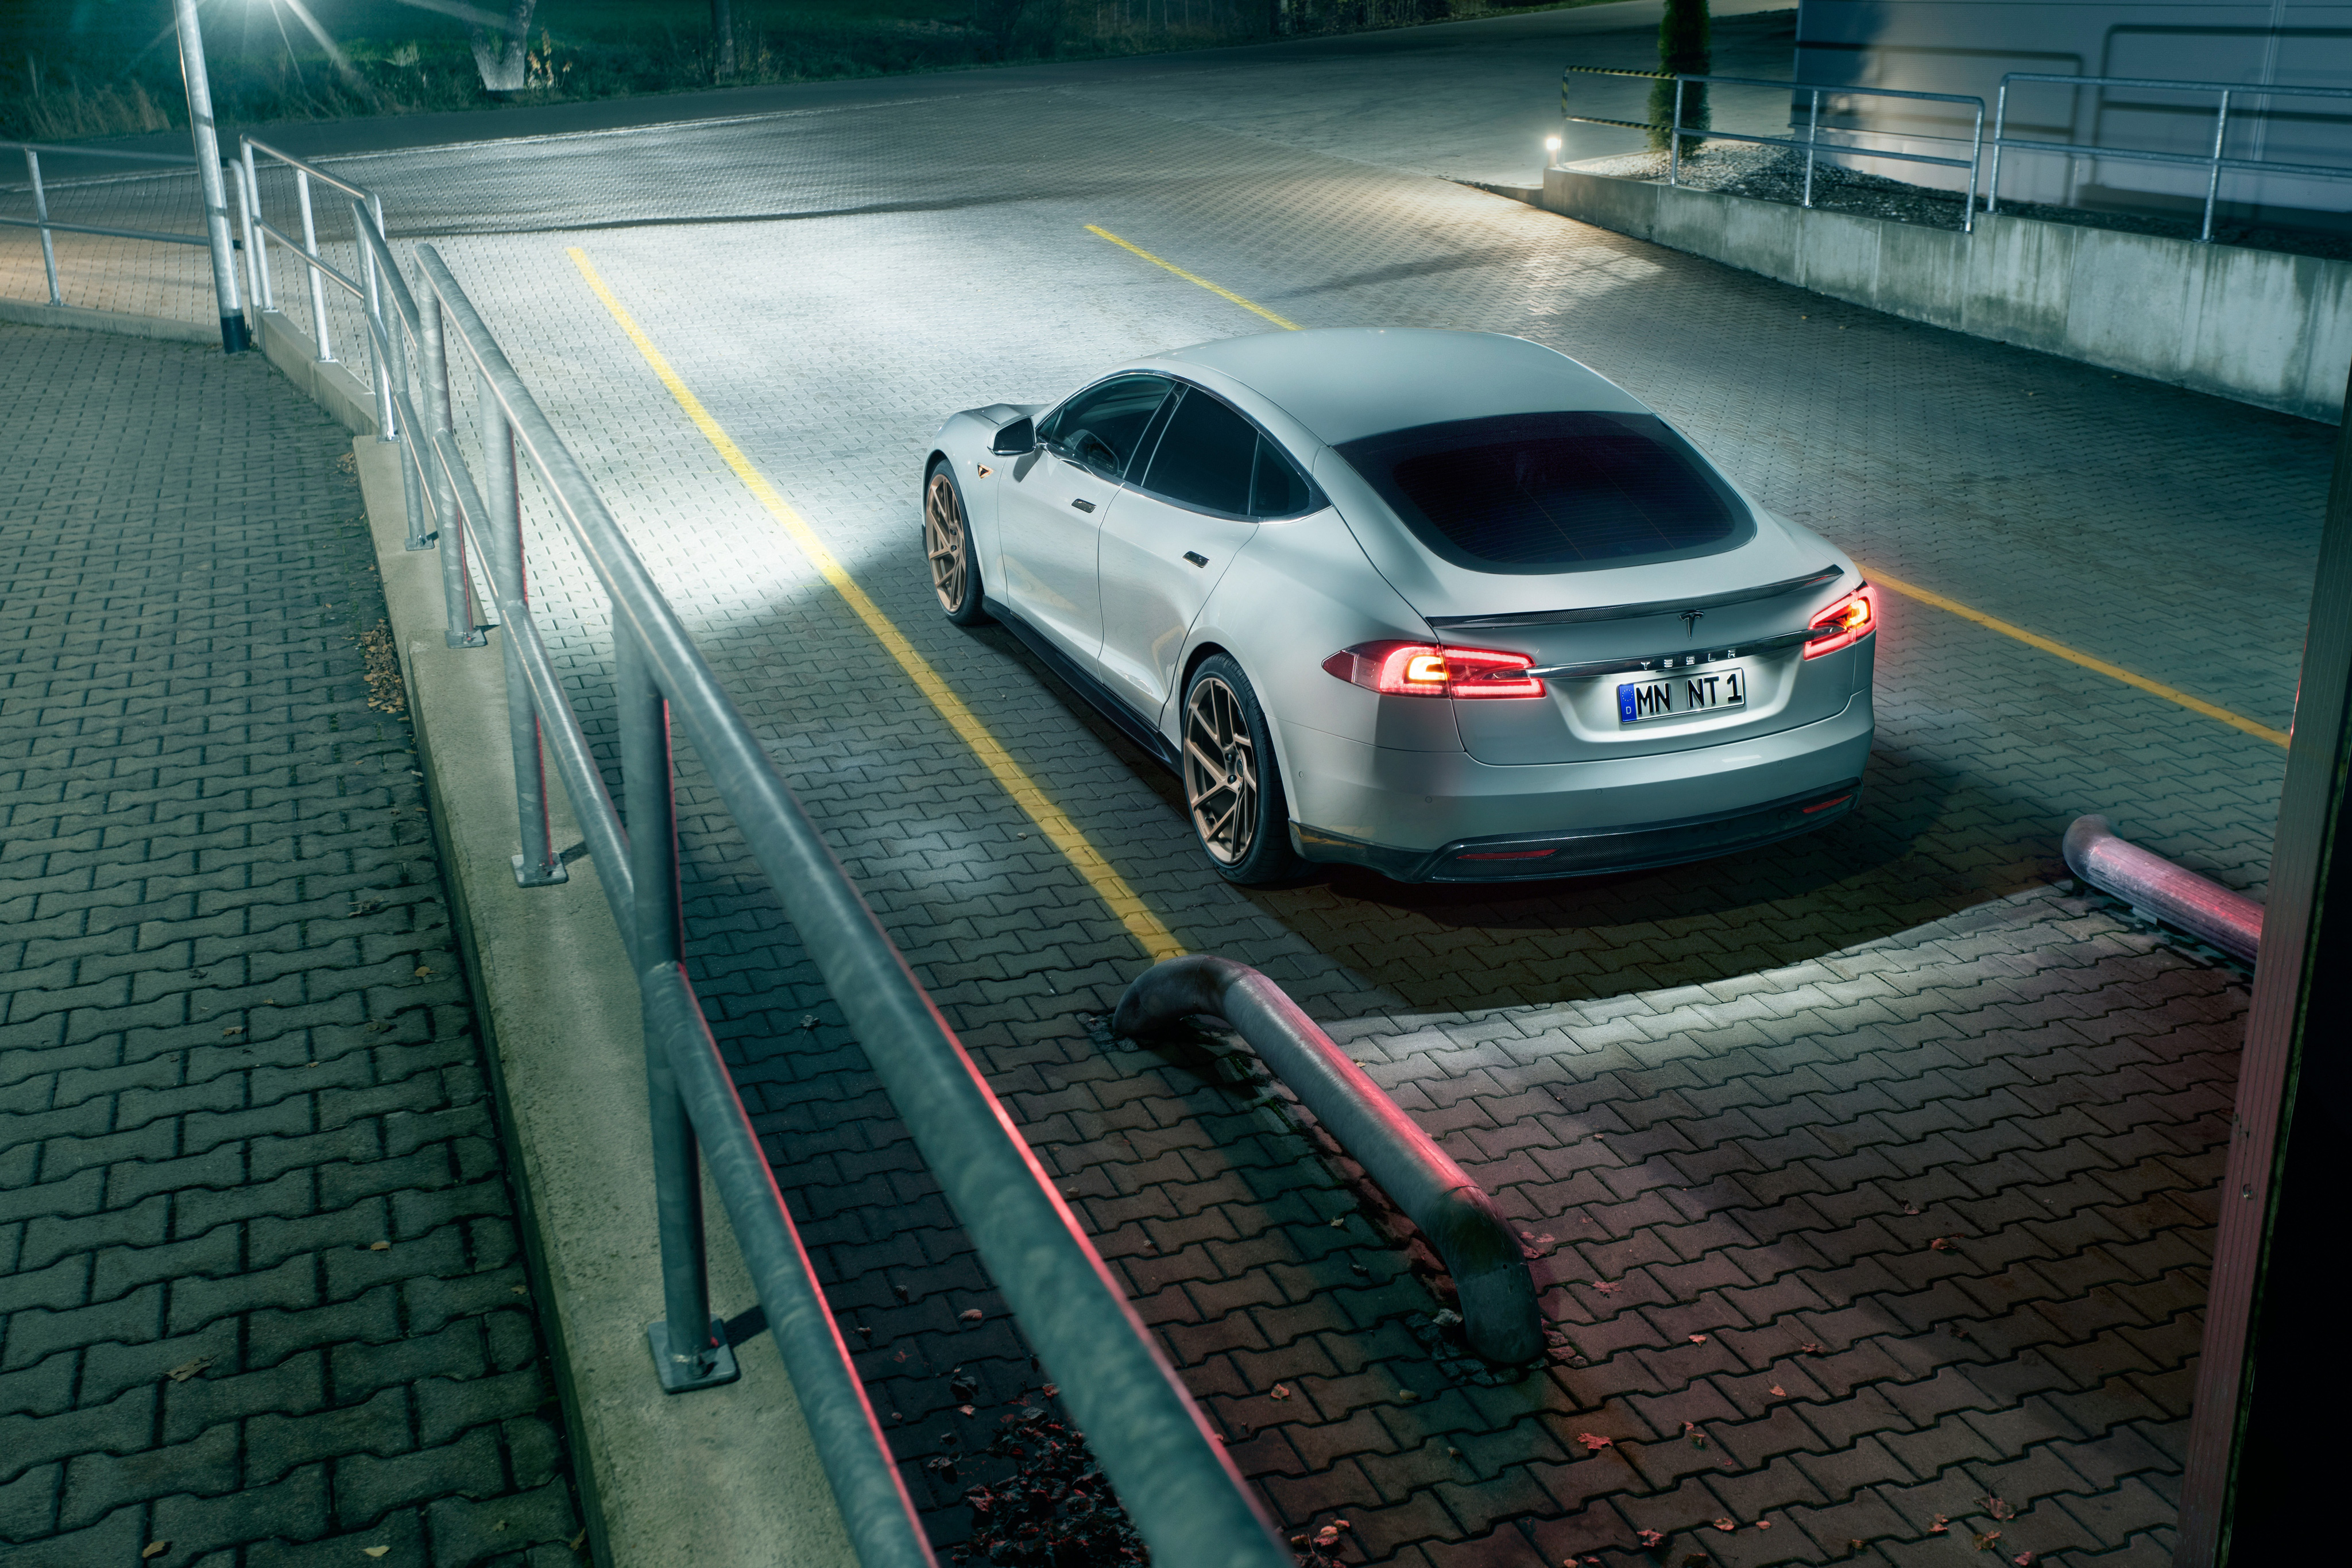 2018 tesla model s novitec, hd cars, 4k wallpapers, images